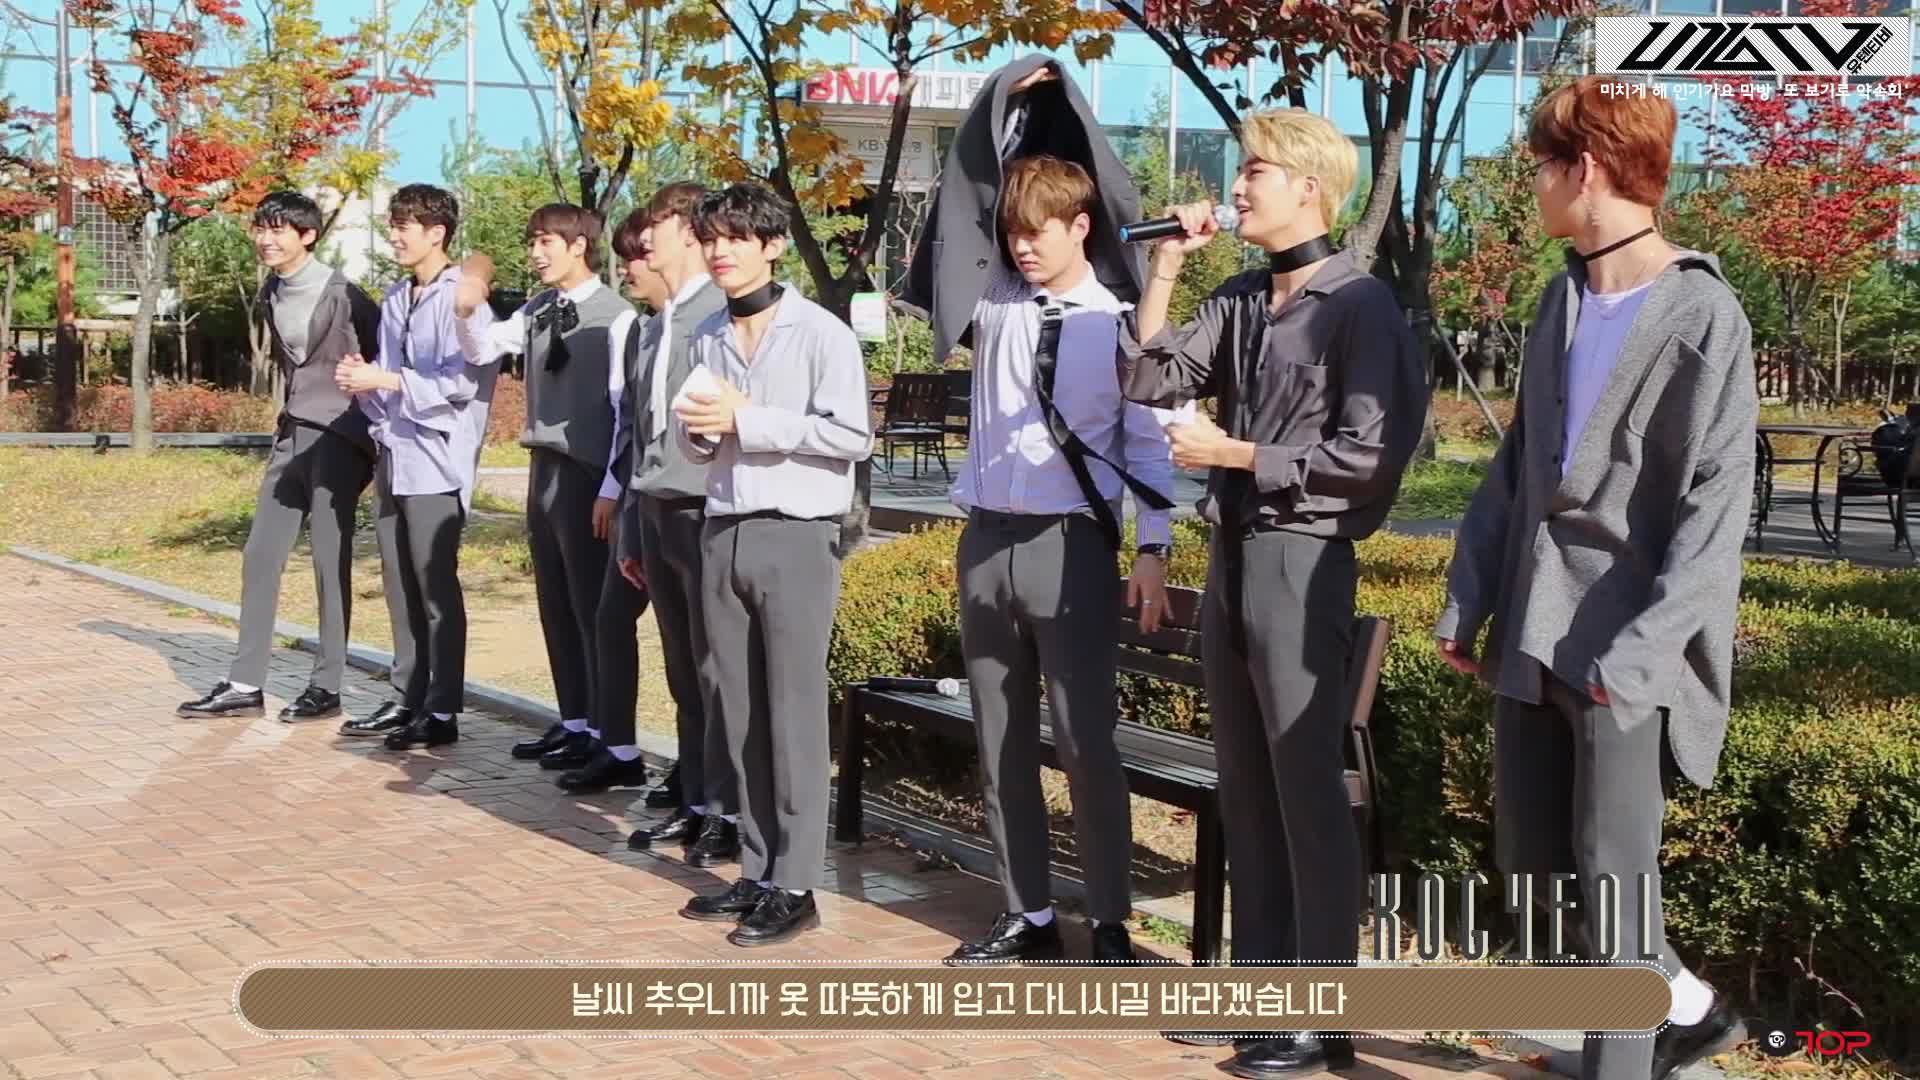 U10TV ep 160 - '미치게 해' 막방! '또 보기로 약속회'